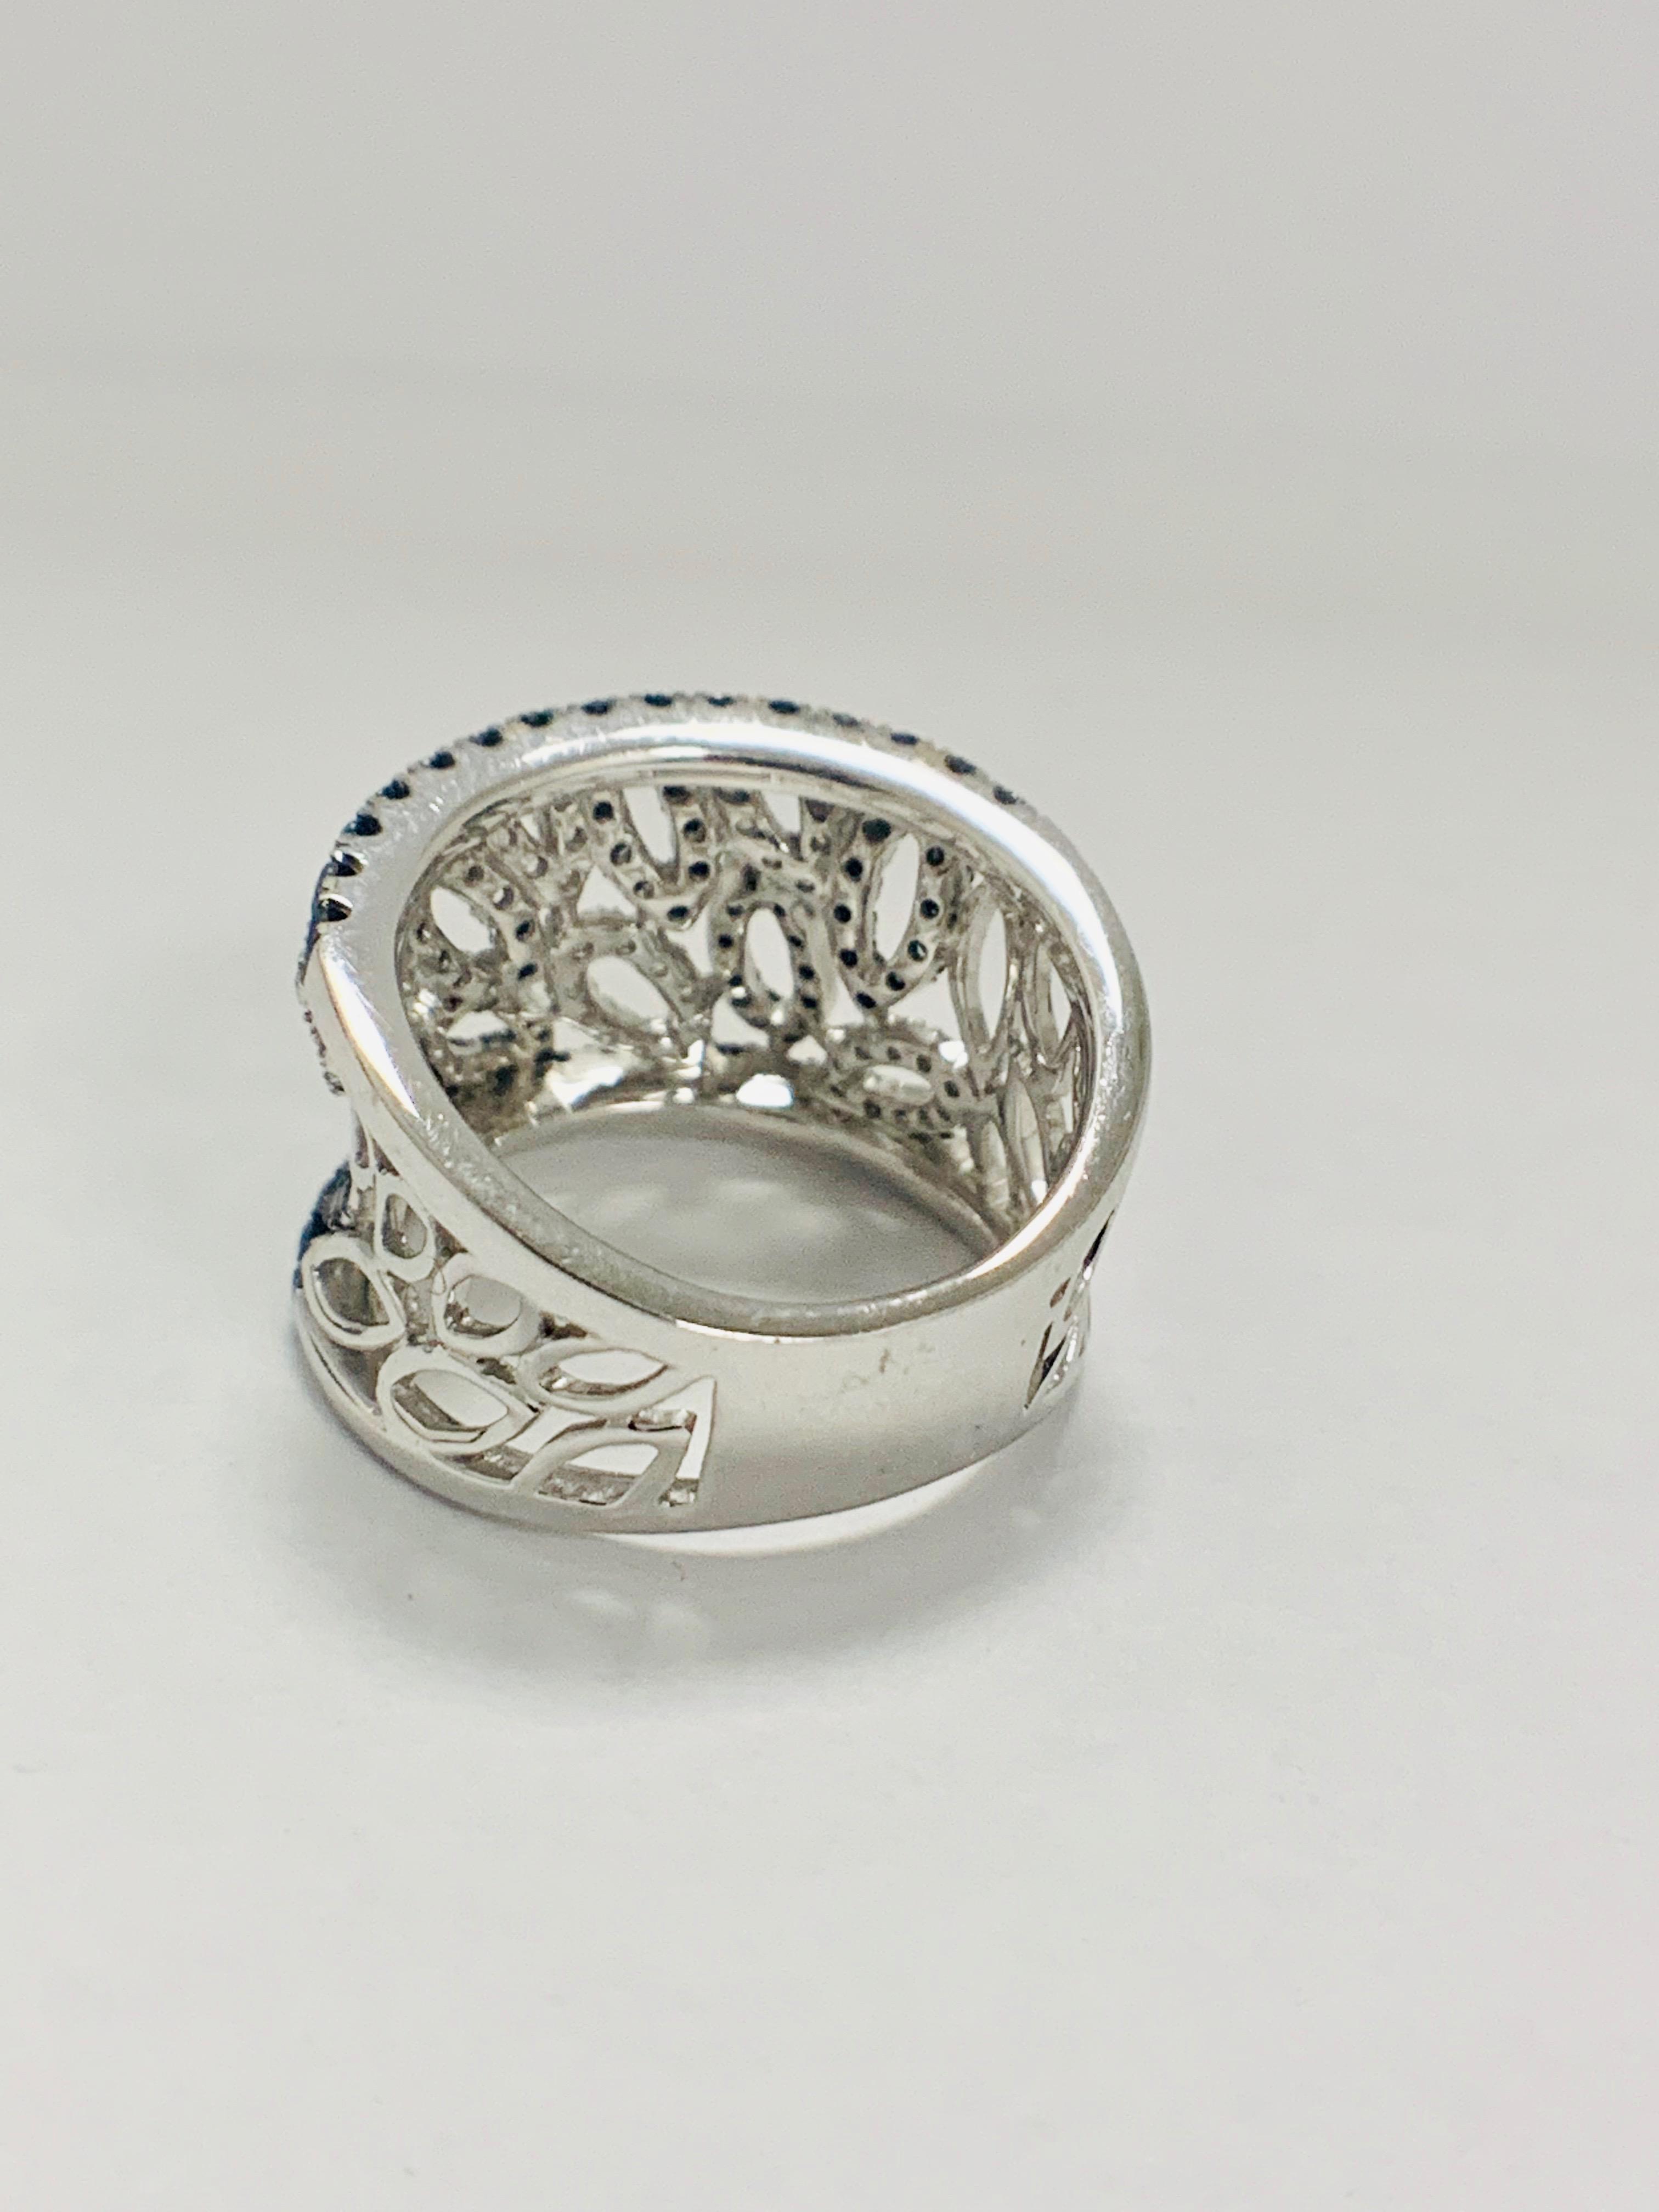 18ct White Gold Diamond ring featuring 90 round cut, black Diamonds (1.14ct TBDW) - Image 8 of 15